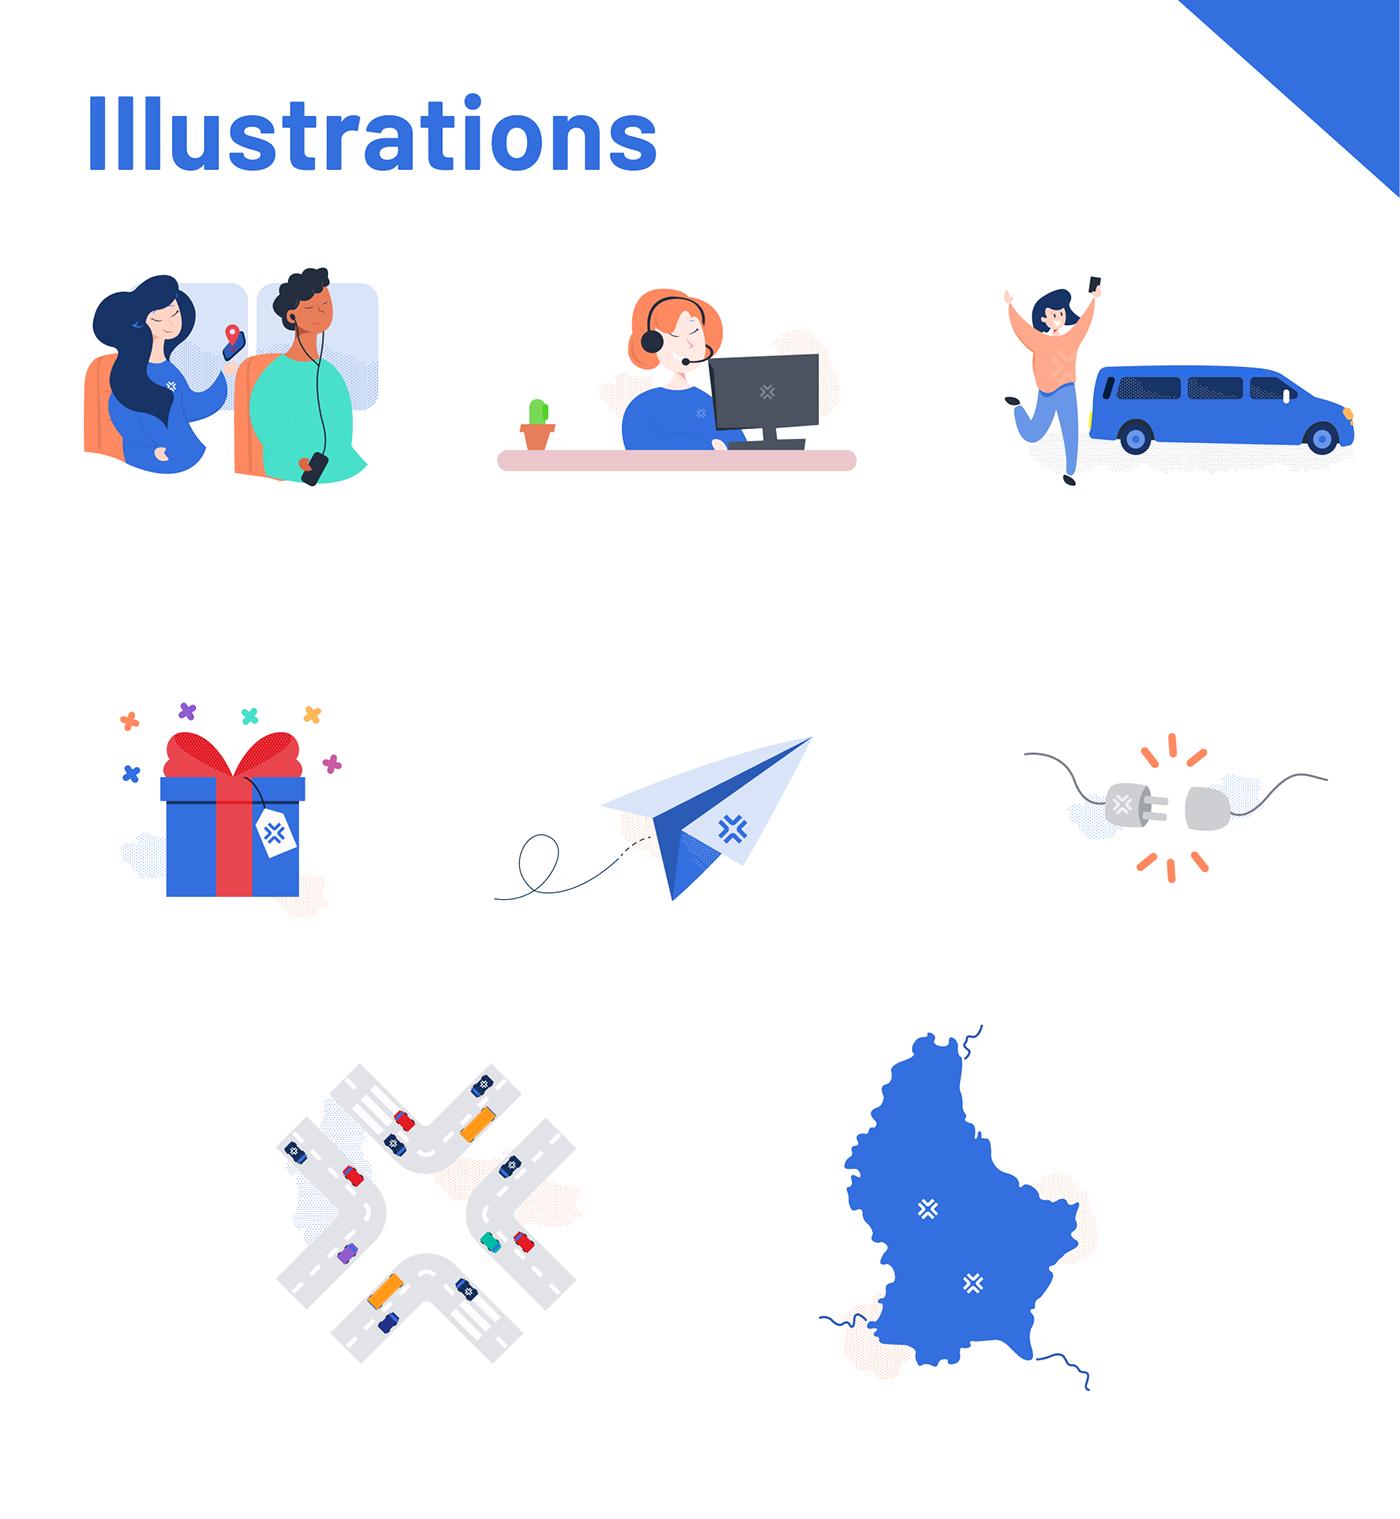 UFT Illustrations Gallery